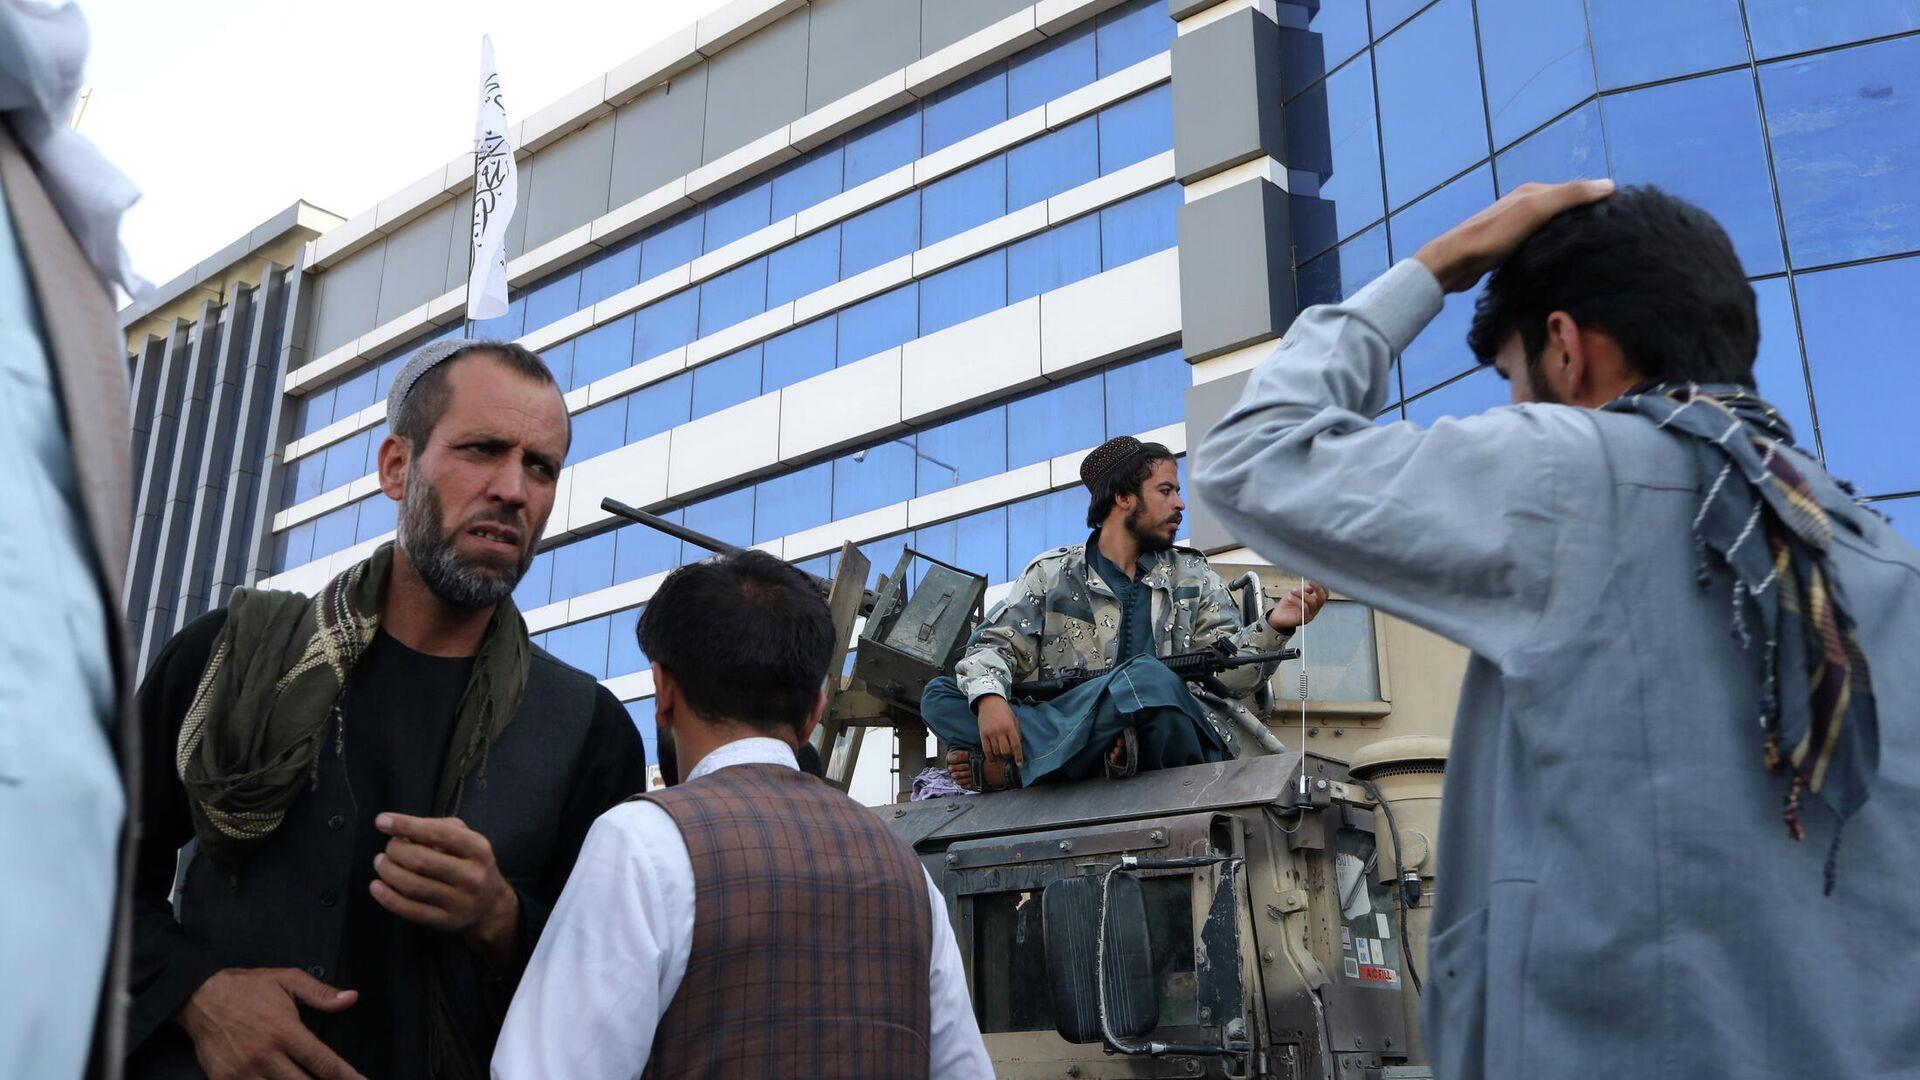 Talibanes en Kabul, Afganistán - Sputnik Mundo, 1920, 02.09.2021